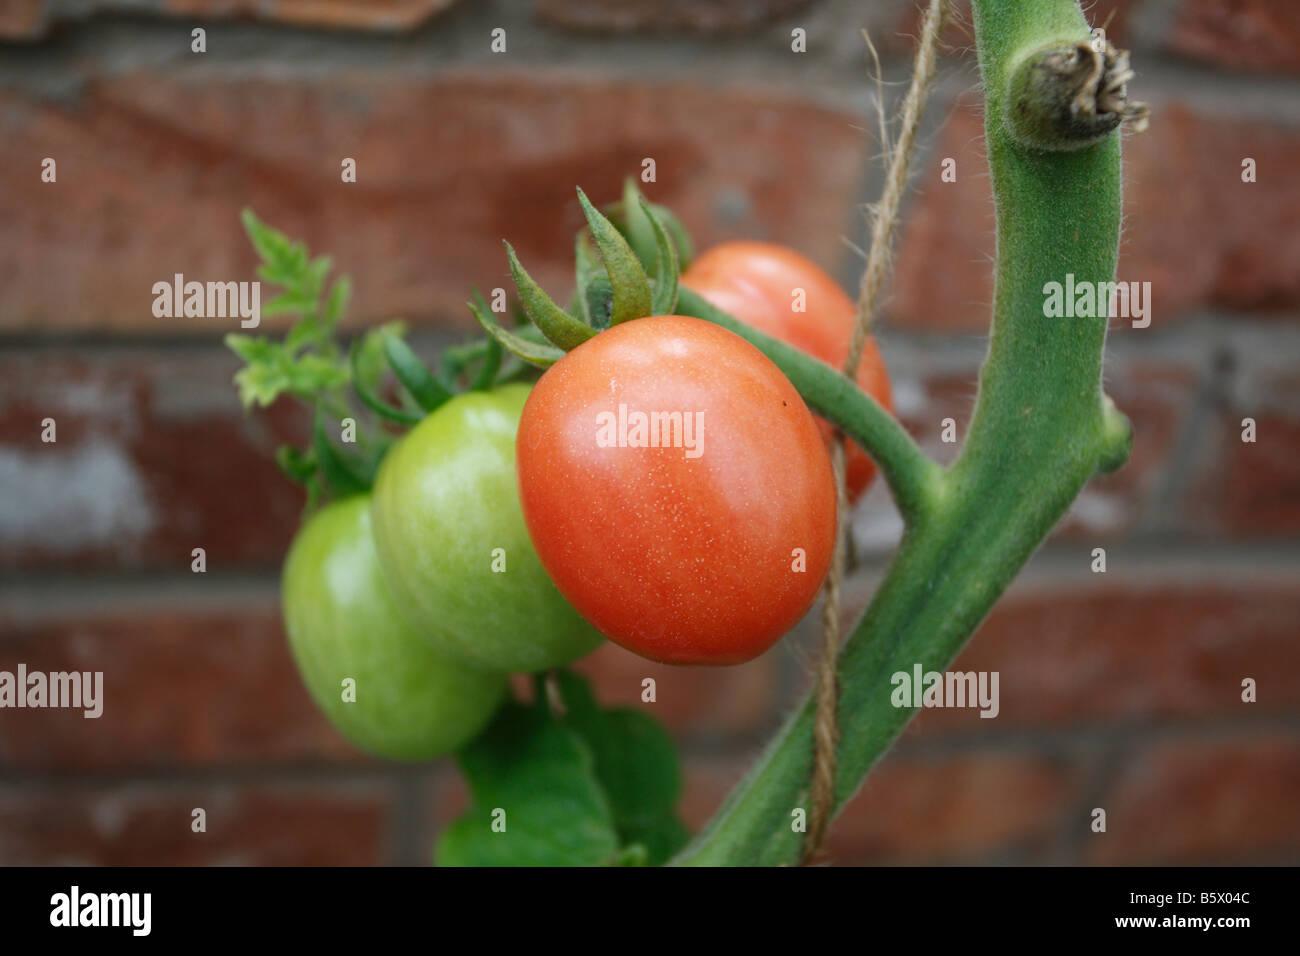 TOMATO Solanum lycopersicum PINK PLUM CLOSE UP OF FRUIT - Stock Image